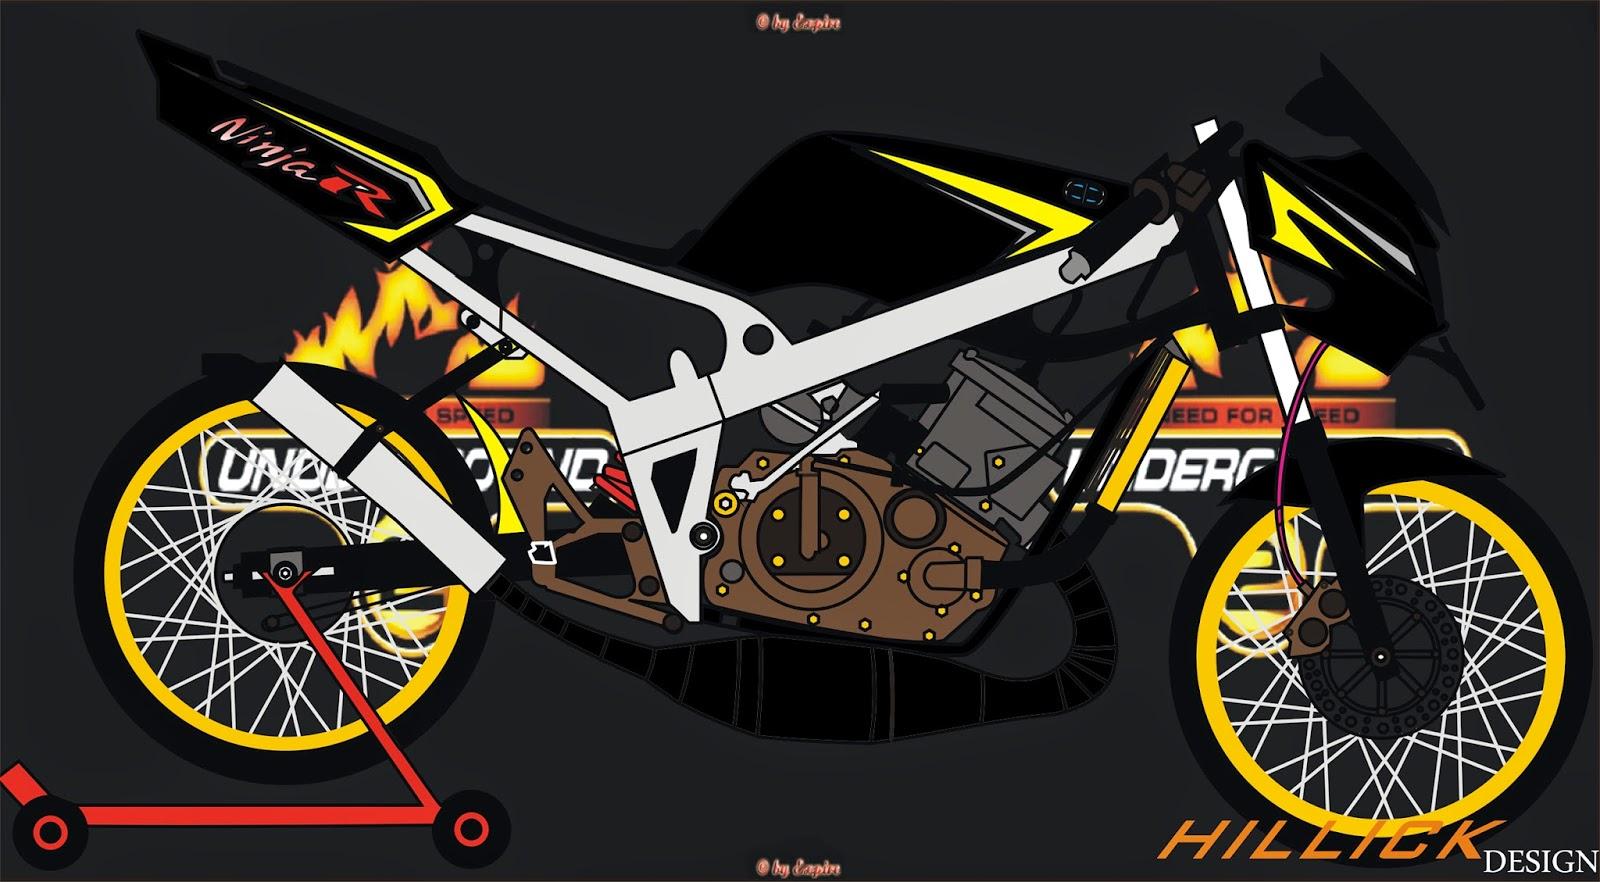 Kumpulan 96 Gambar Sketsa Motor Ninja Drag Terbaik Motor Jepit